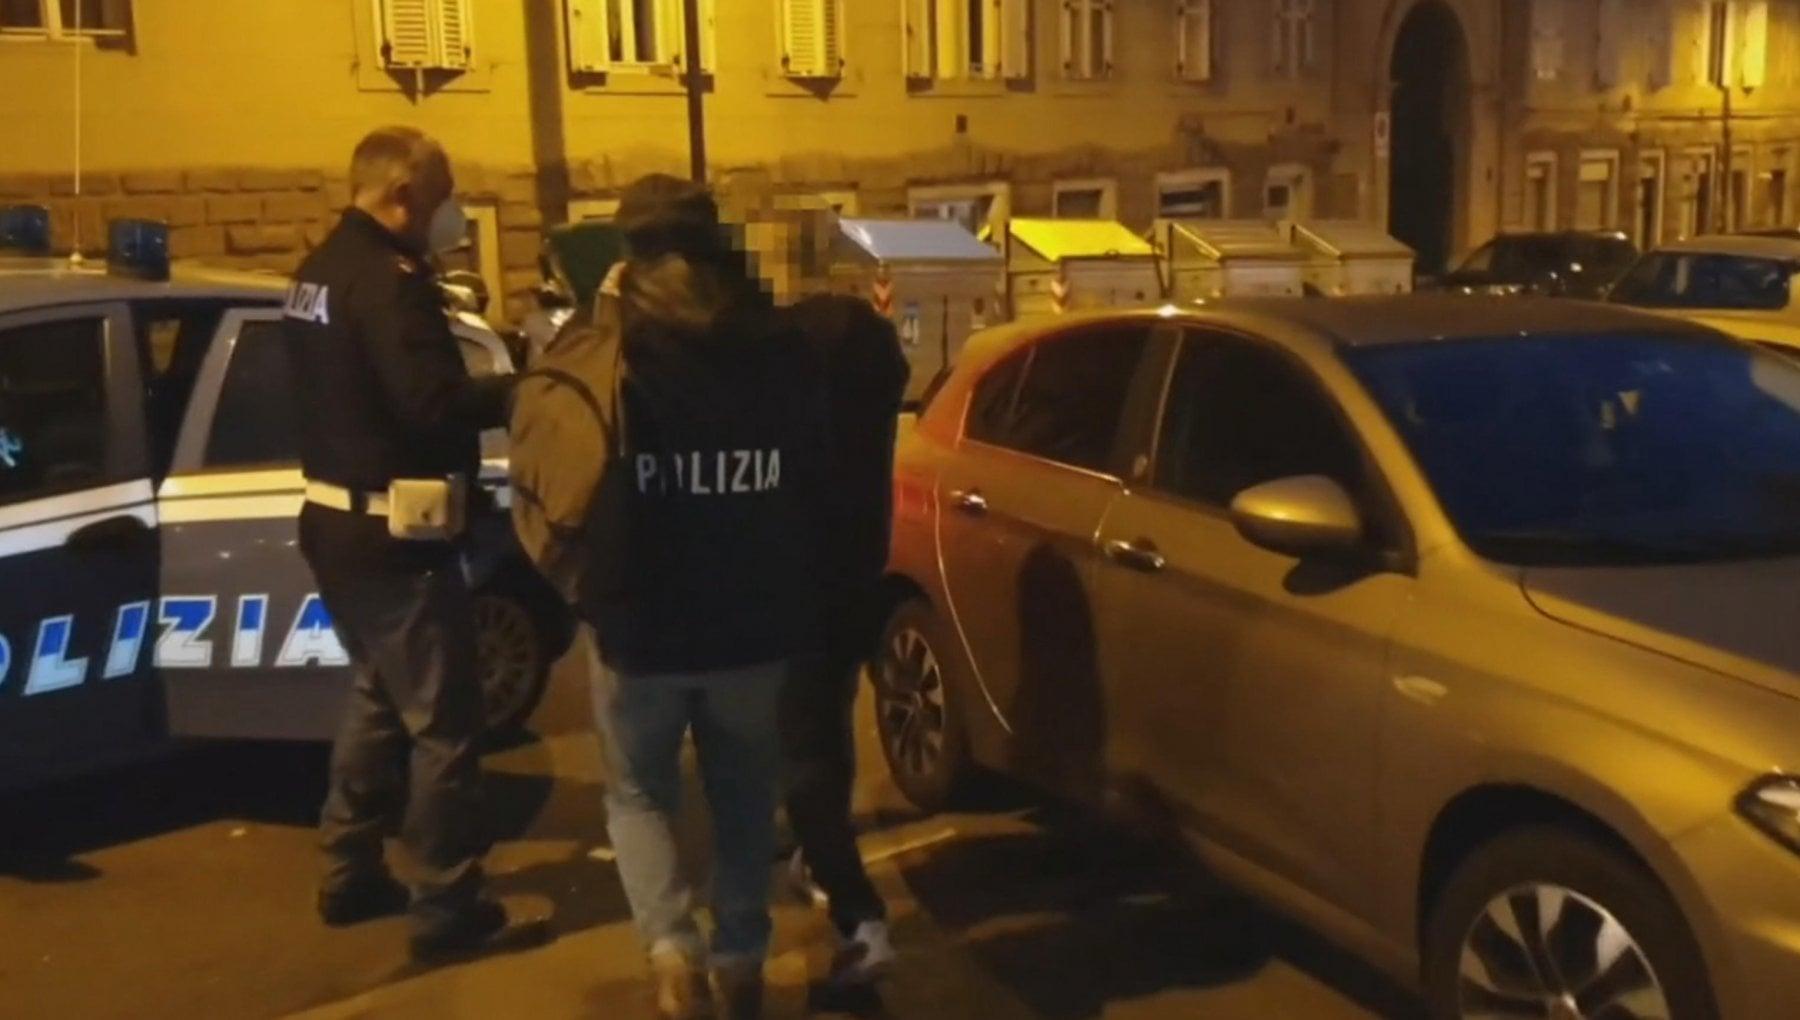 074919452 a44c4a33 ea47 491e 9fde 99c002aeed59 - 'Ndrangheta, 10 arresti in Emilia-Romagna e 35 perquisizioni in 6 regioni